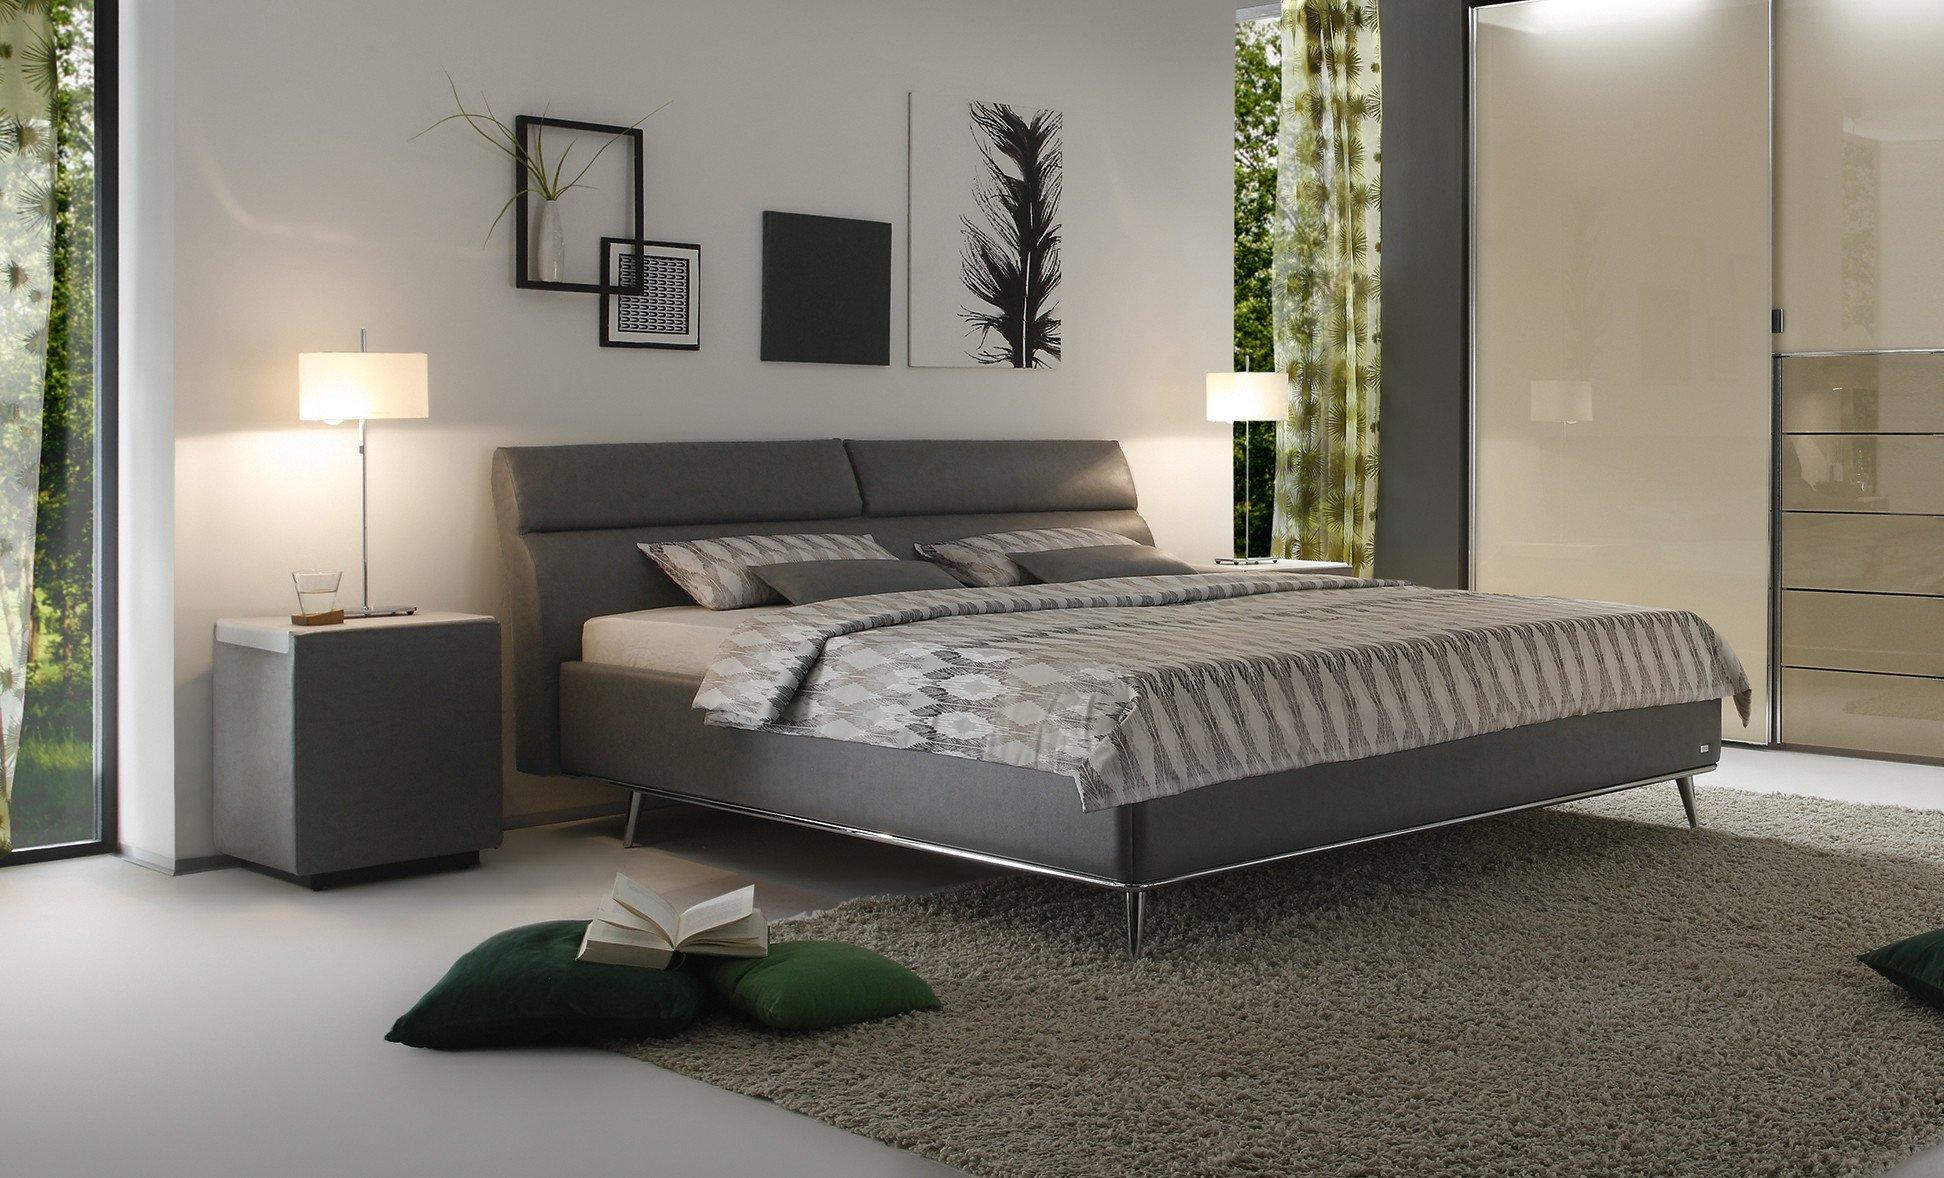 ruf bett casa ktd, ruf polsterbett modell casa im eleganten grauton | möbel letz - ihr, Design ideen